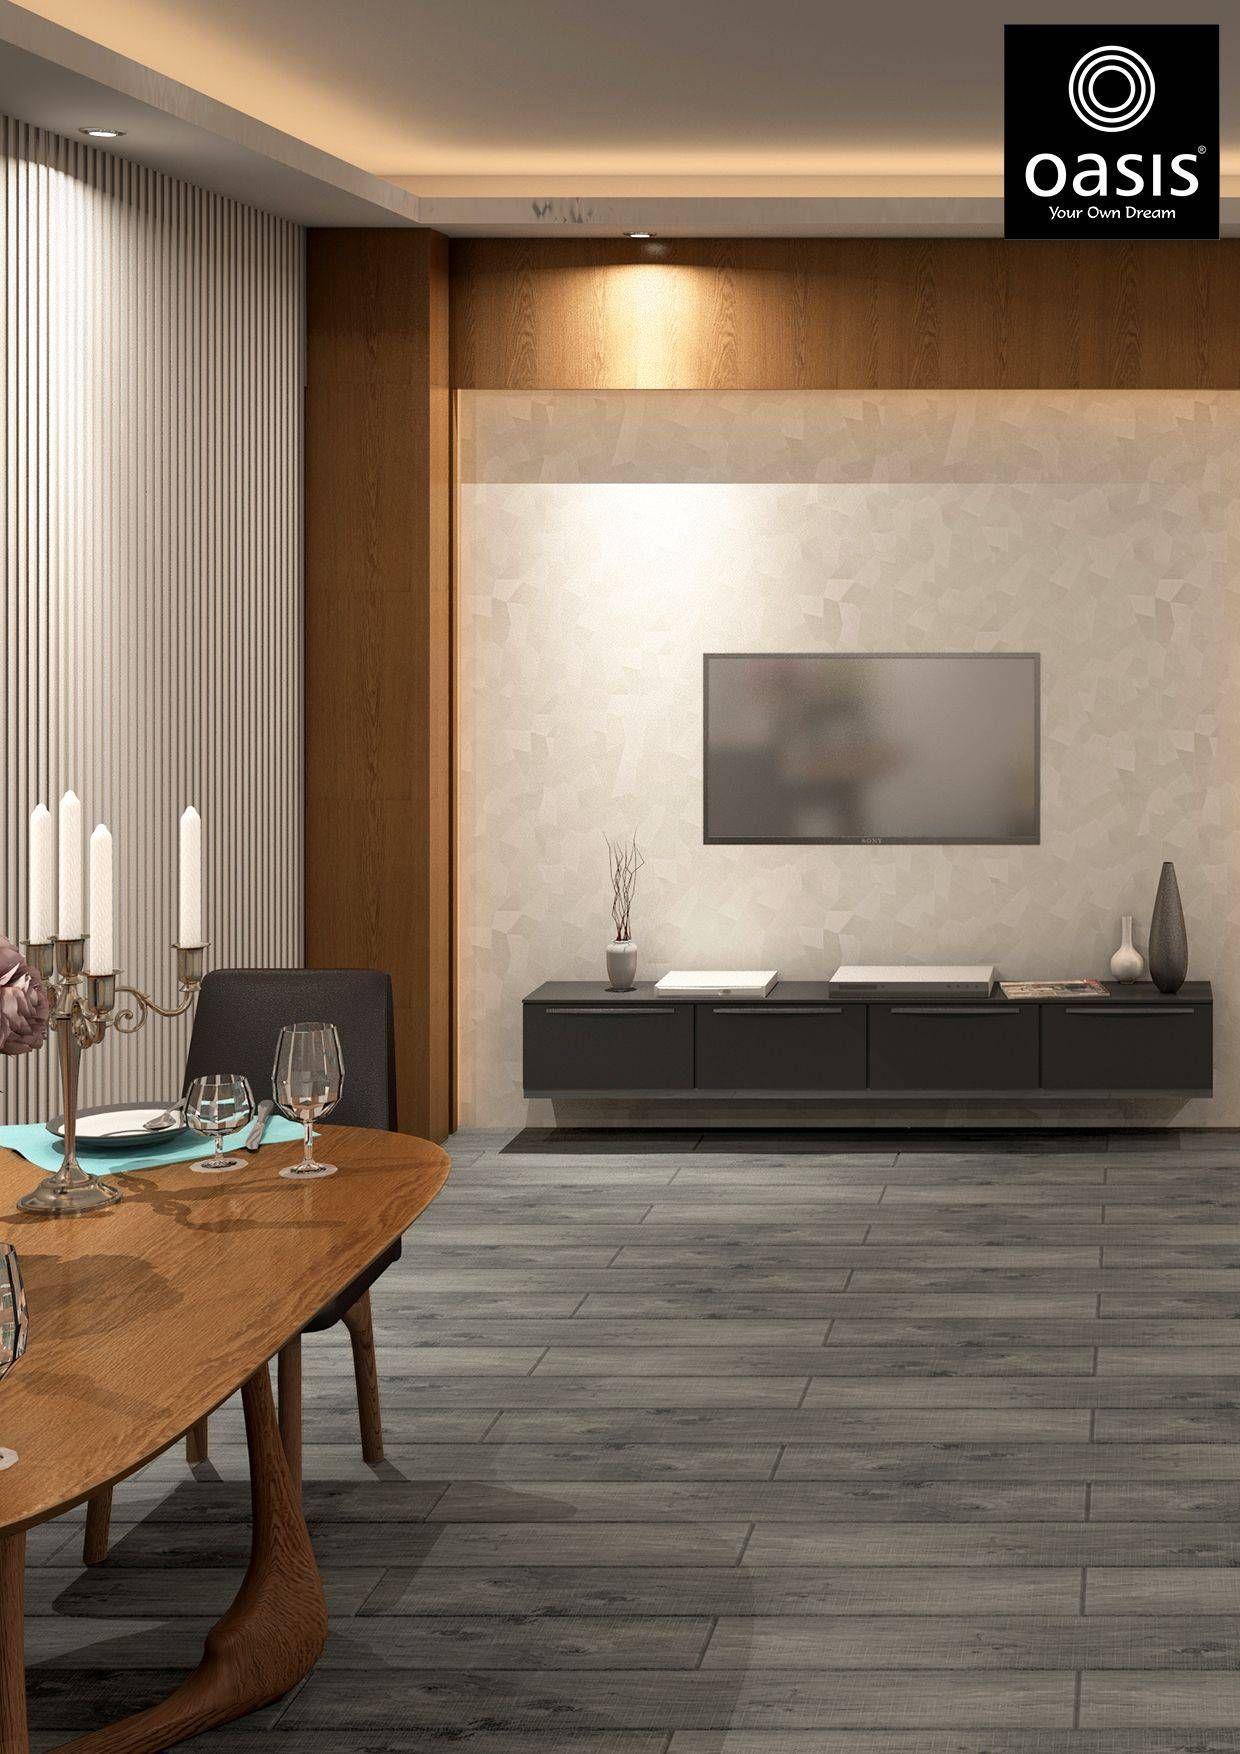 Best Of Floor Tiles Design For House Buildingdesign Homede